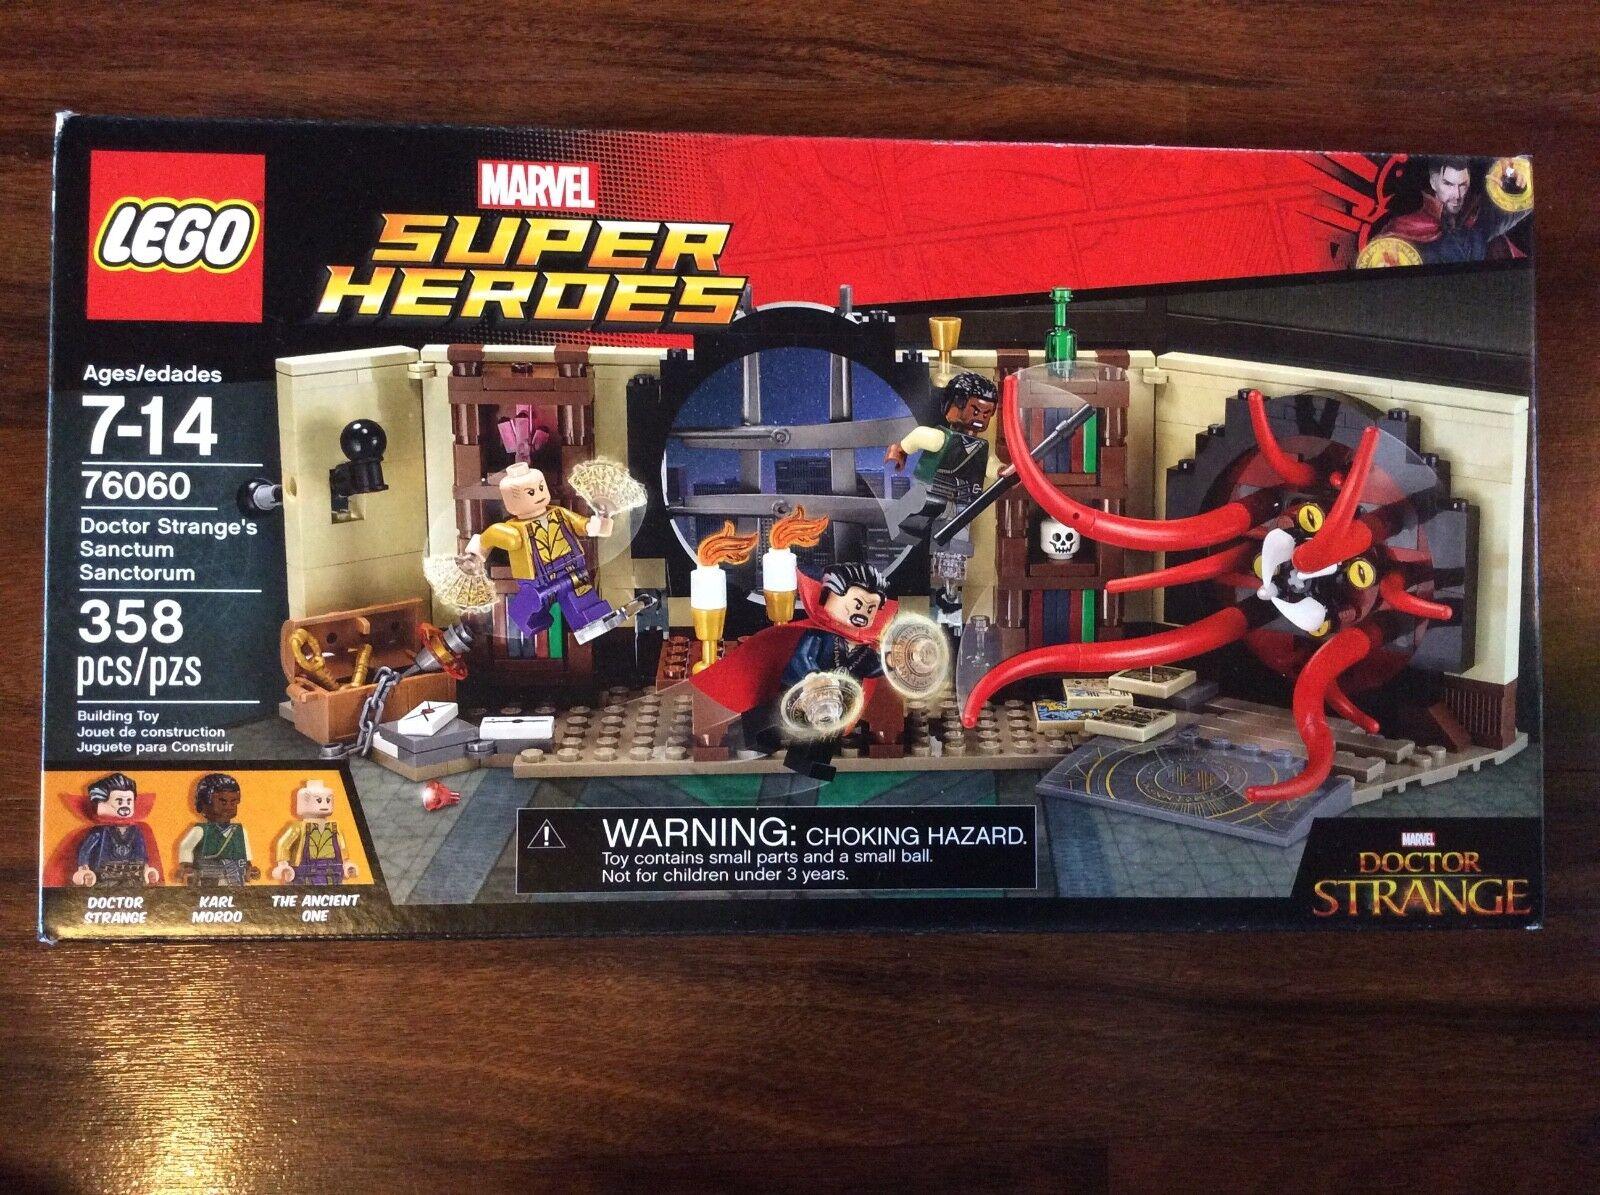 Nuovo Lego Super Heroes Doctor Strange's Sanctum Sanctorum Set 76060 Damaged Box